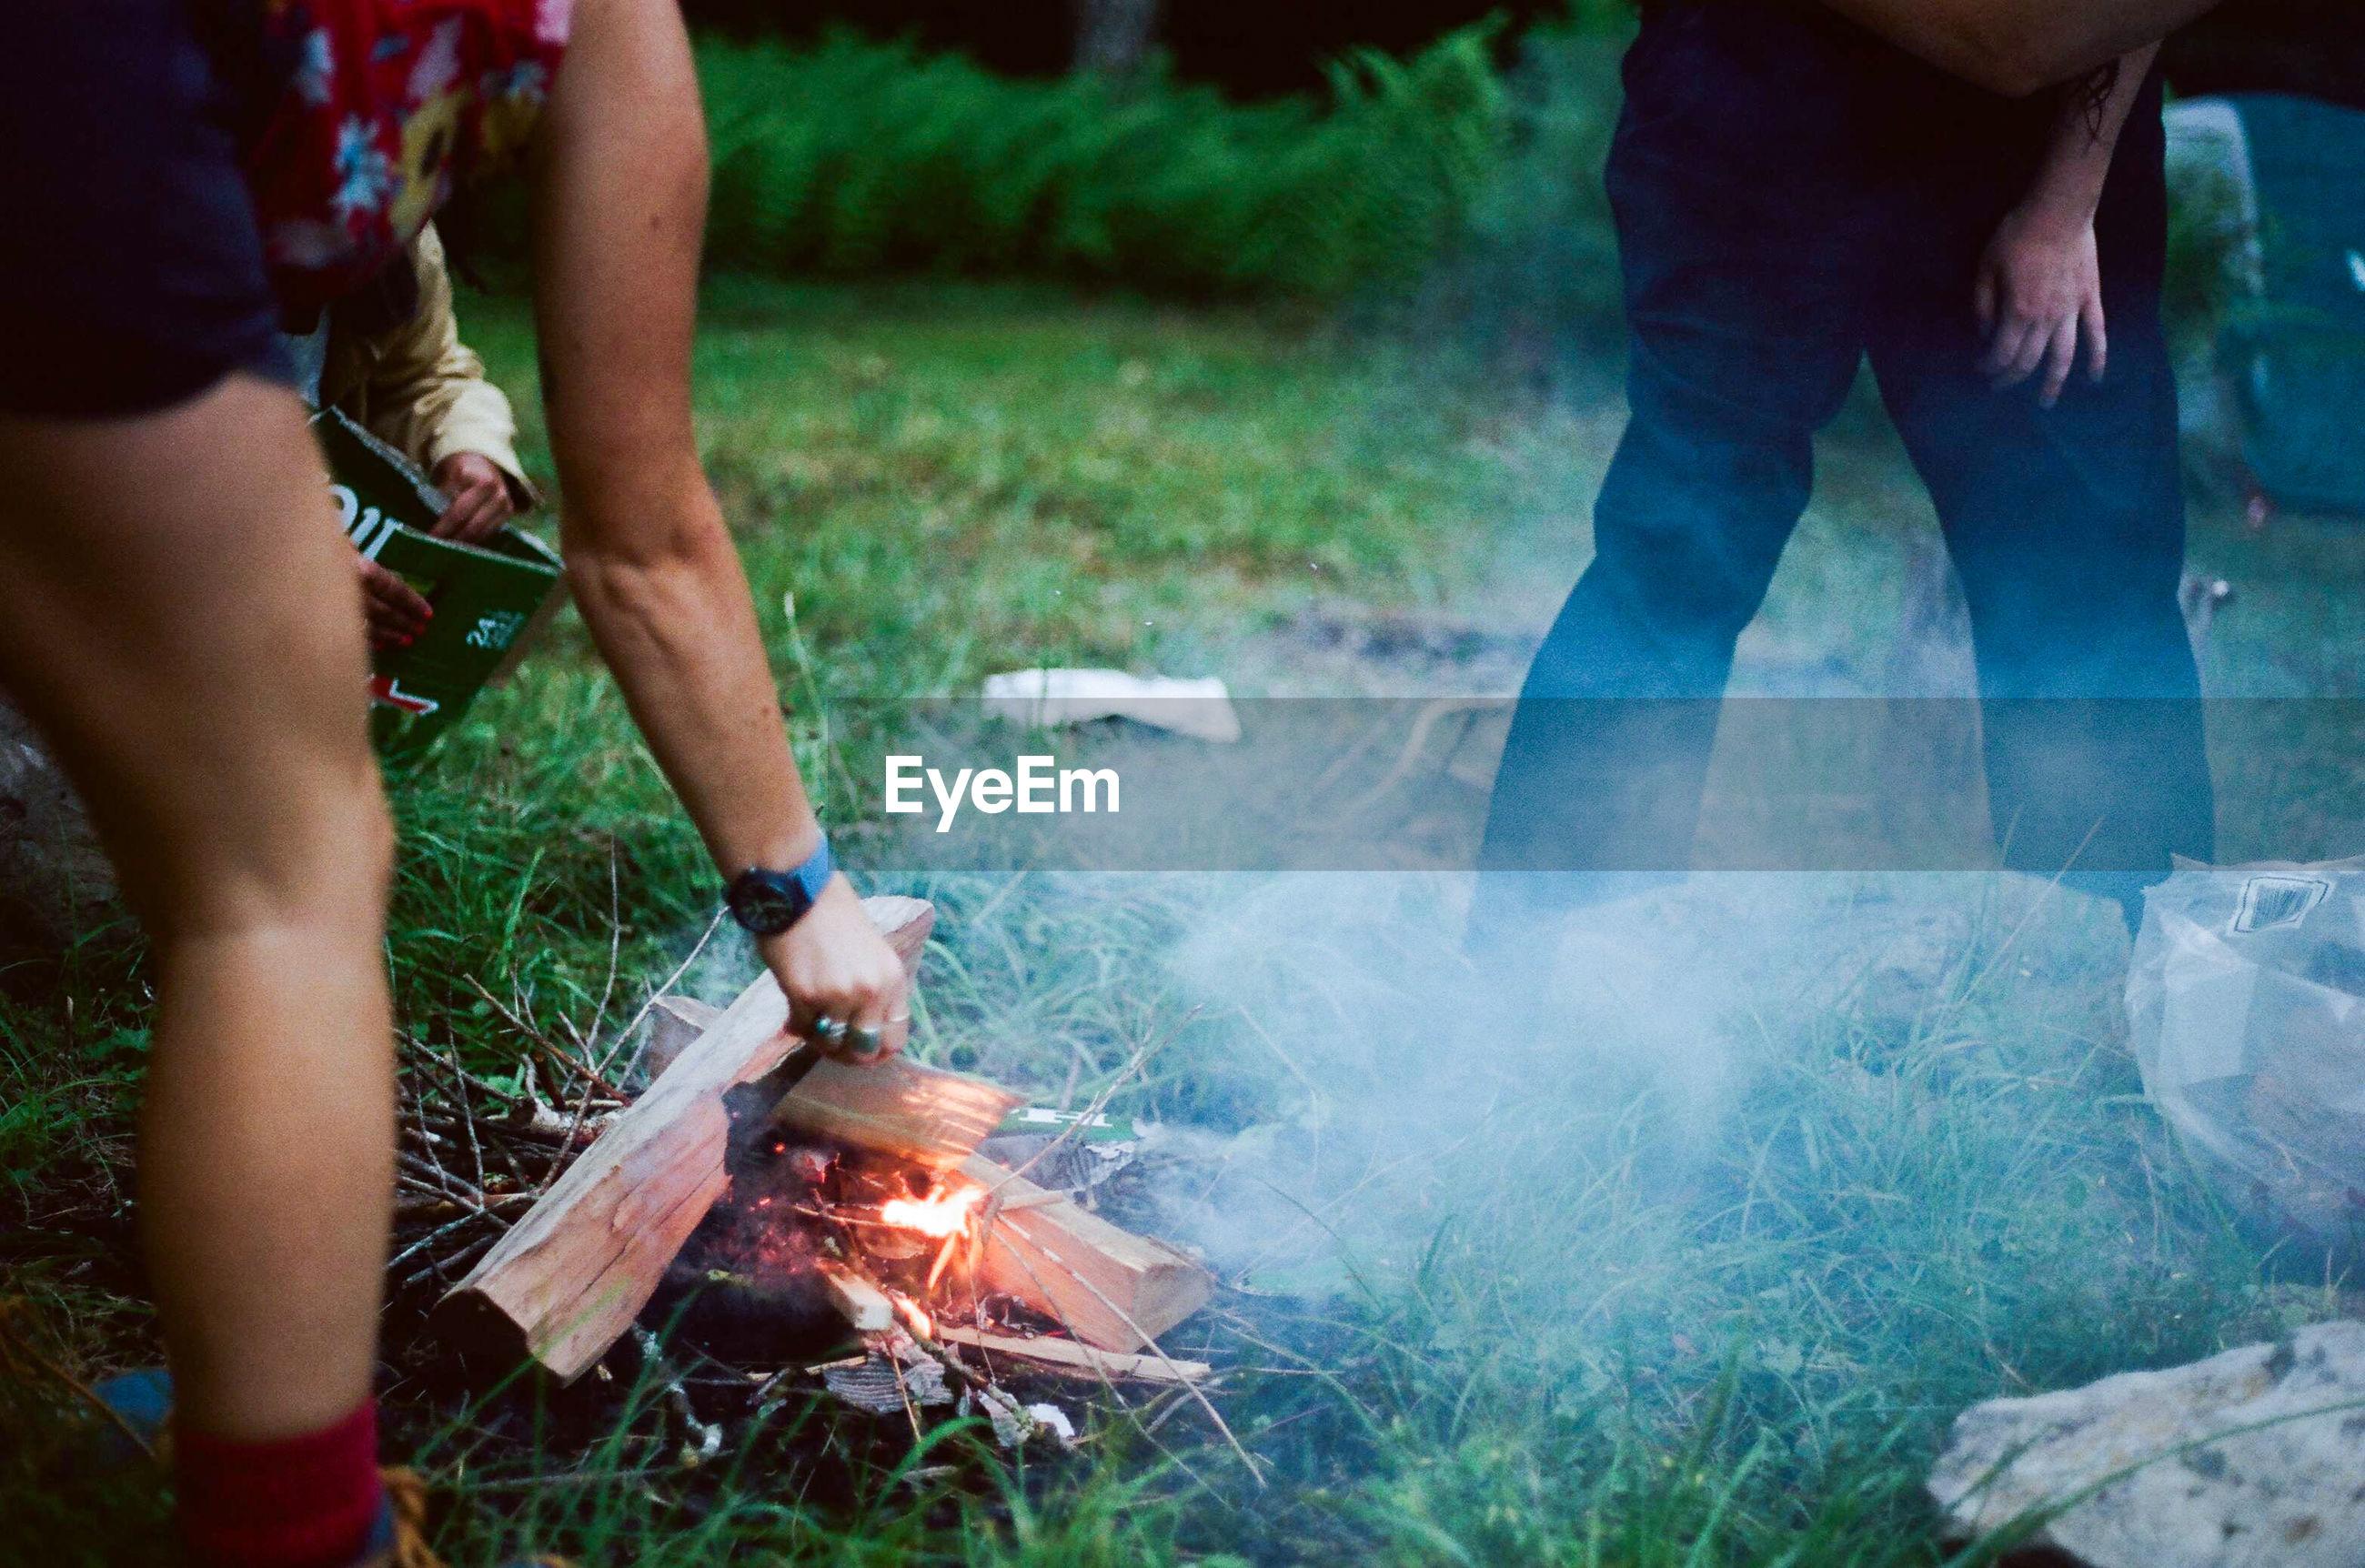 Friends making campfire on grassy field